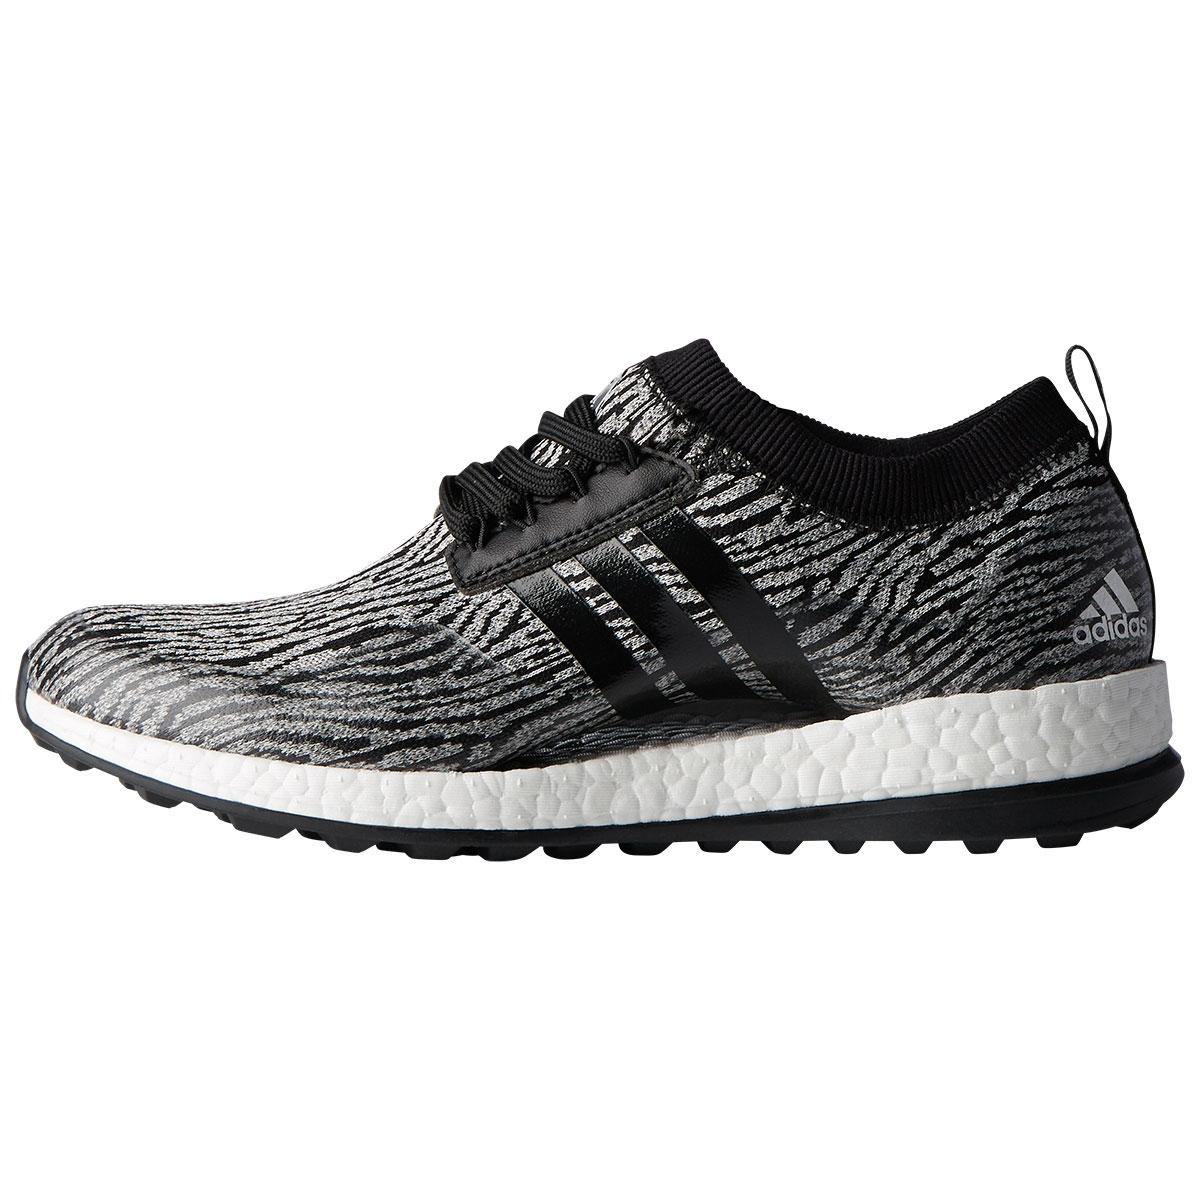 Adidas Womens Pure Boost XG Spikeless Golf Shoe - Black